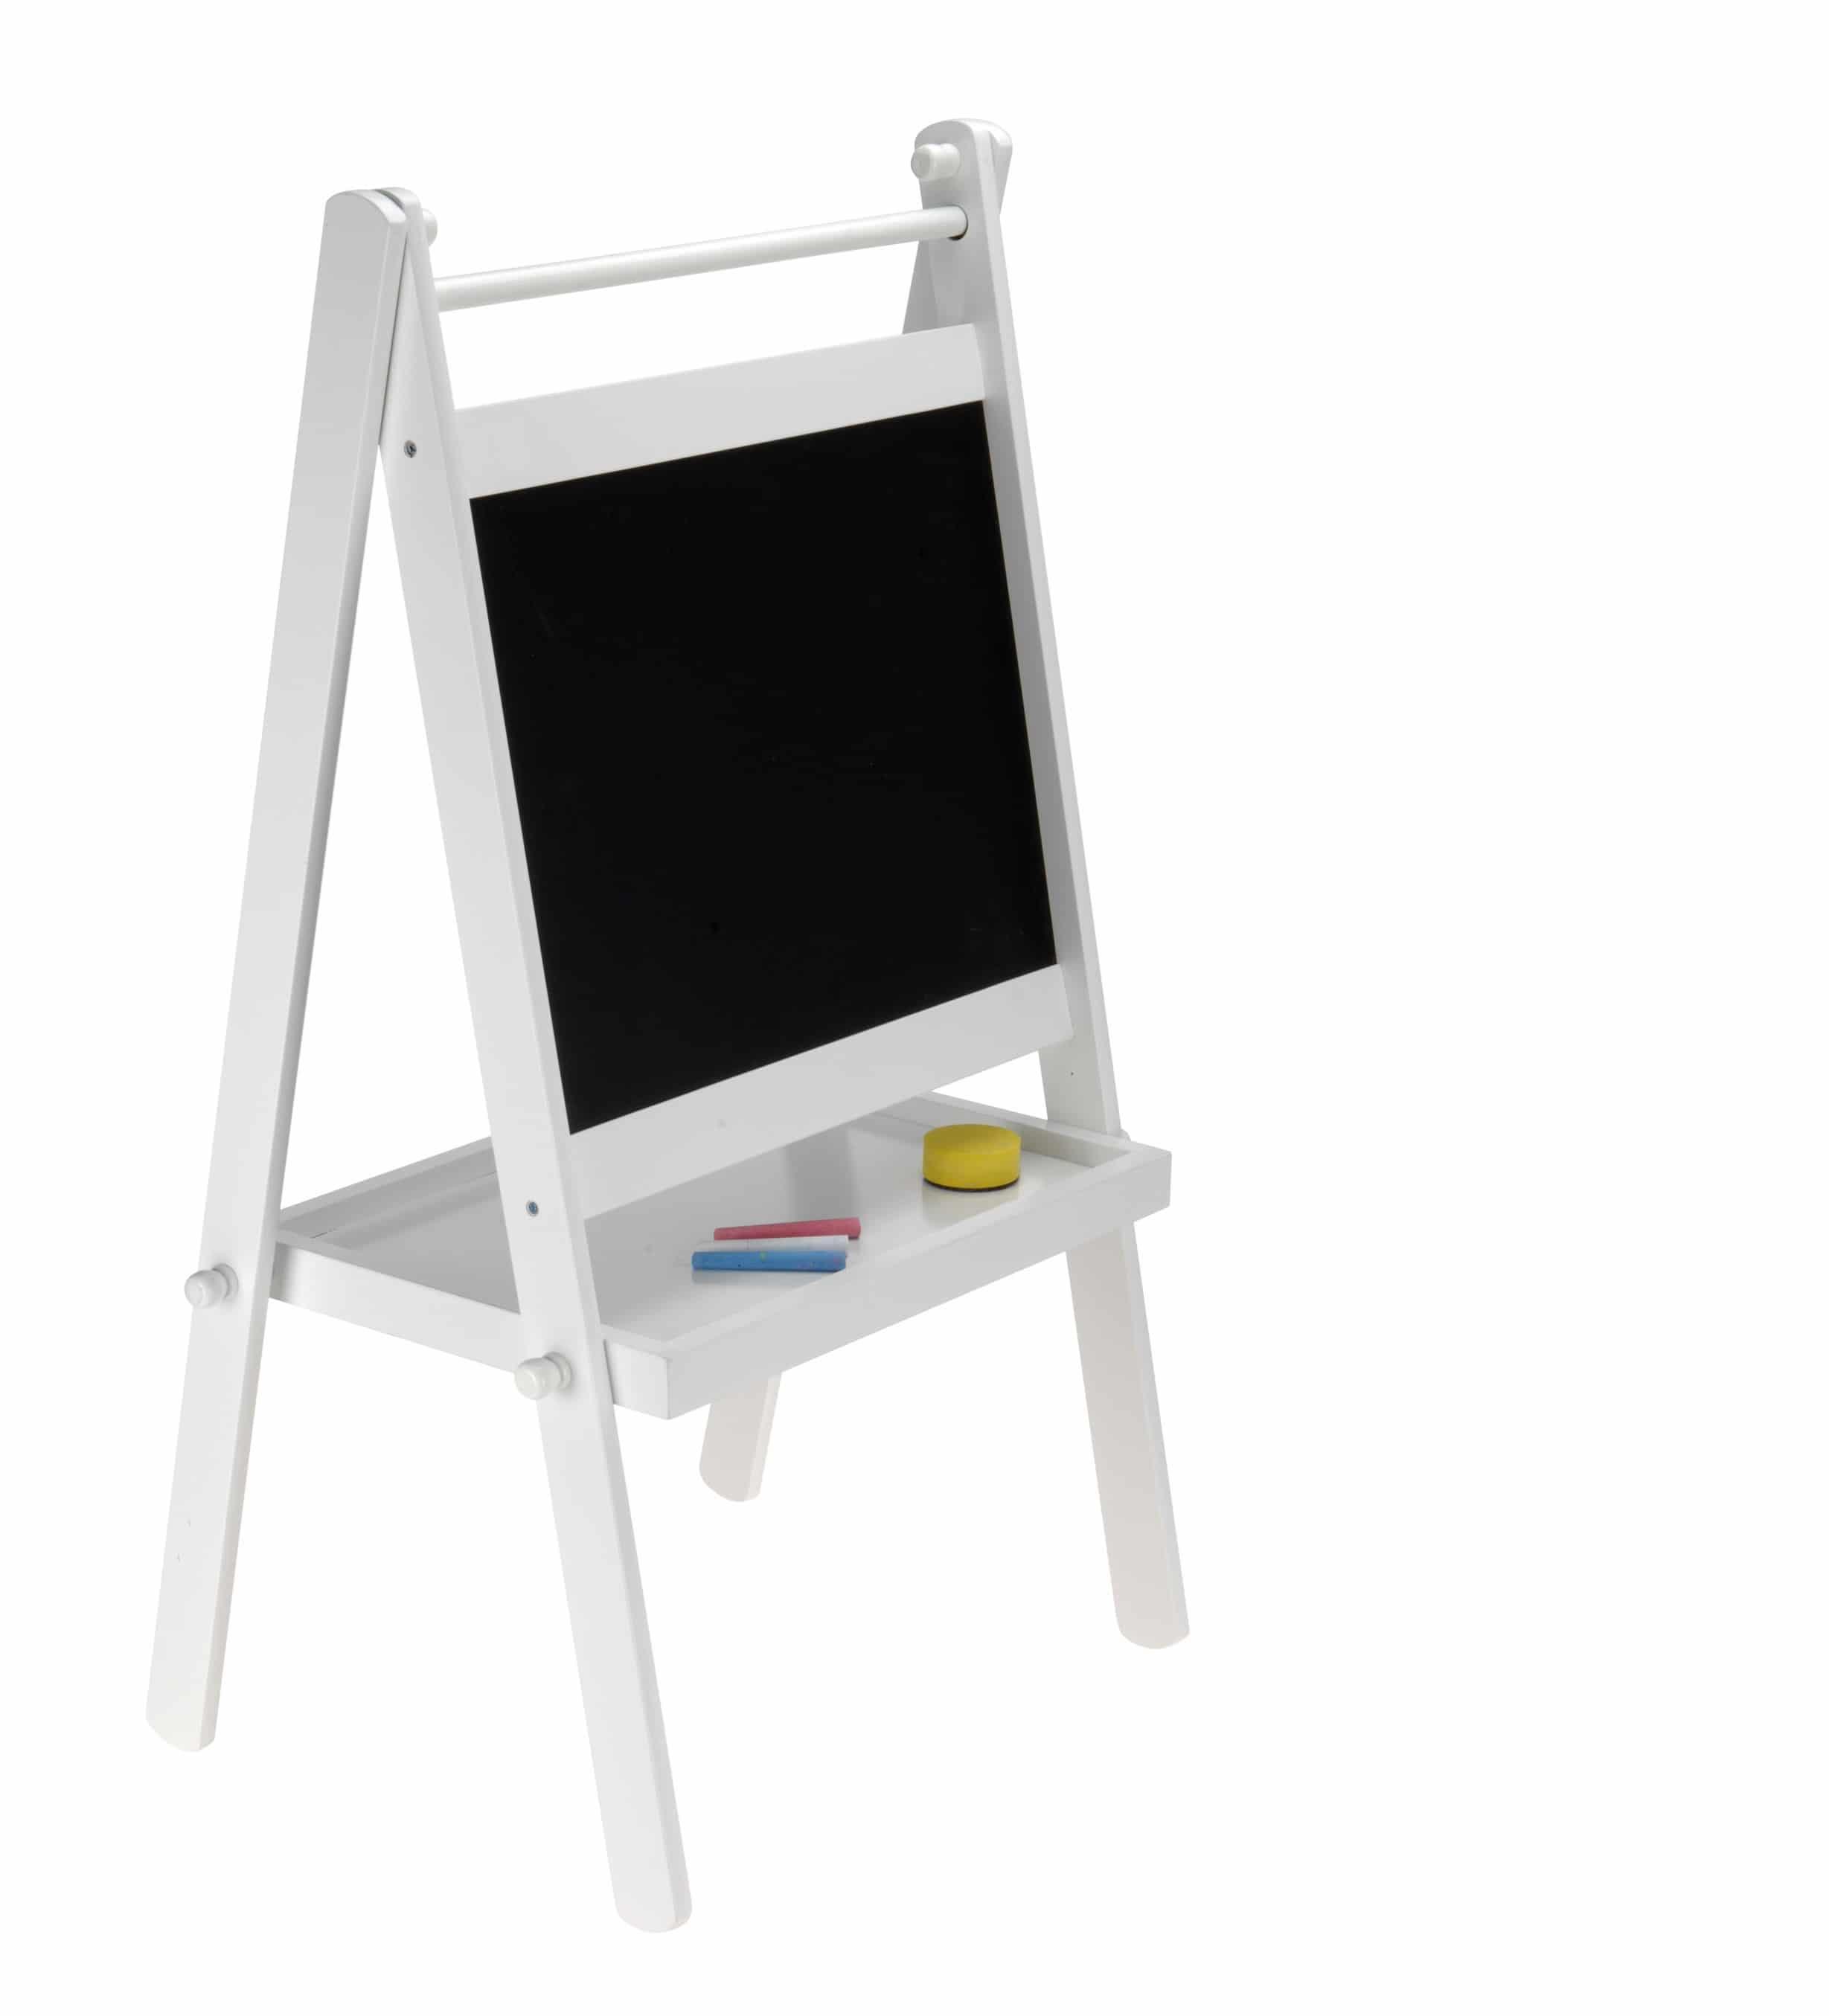 4goodz Wit schoolbord krijtbord inclusief toebehoren - 35x35x78,5 cm